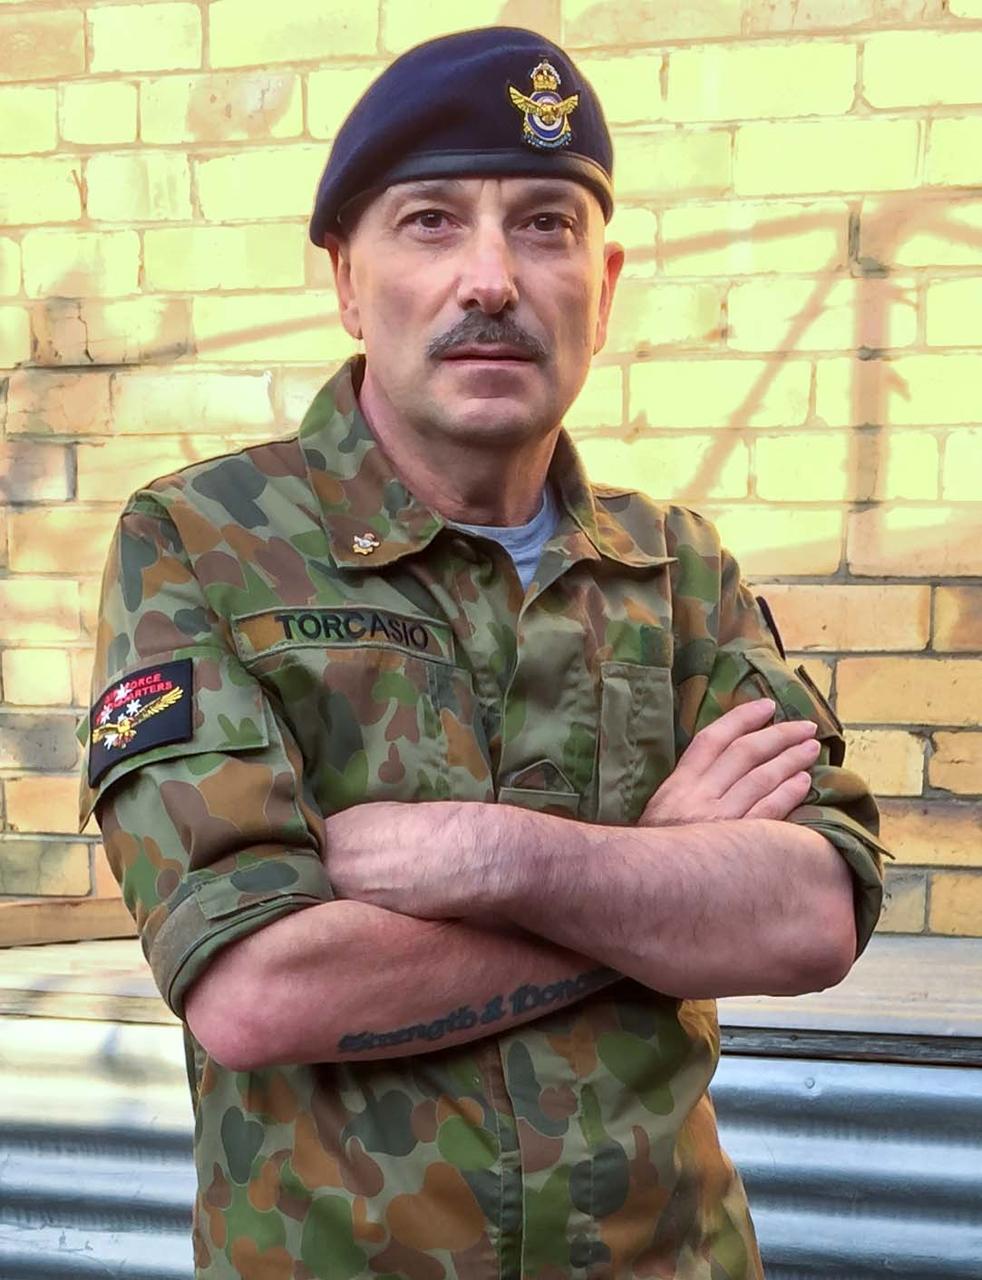 John Torcasio: Wearing Camouflage Uniform